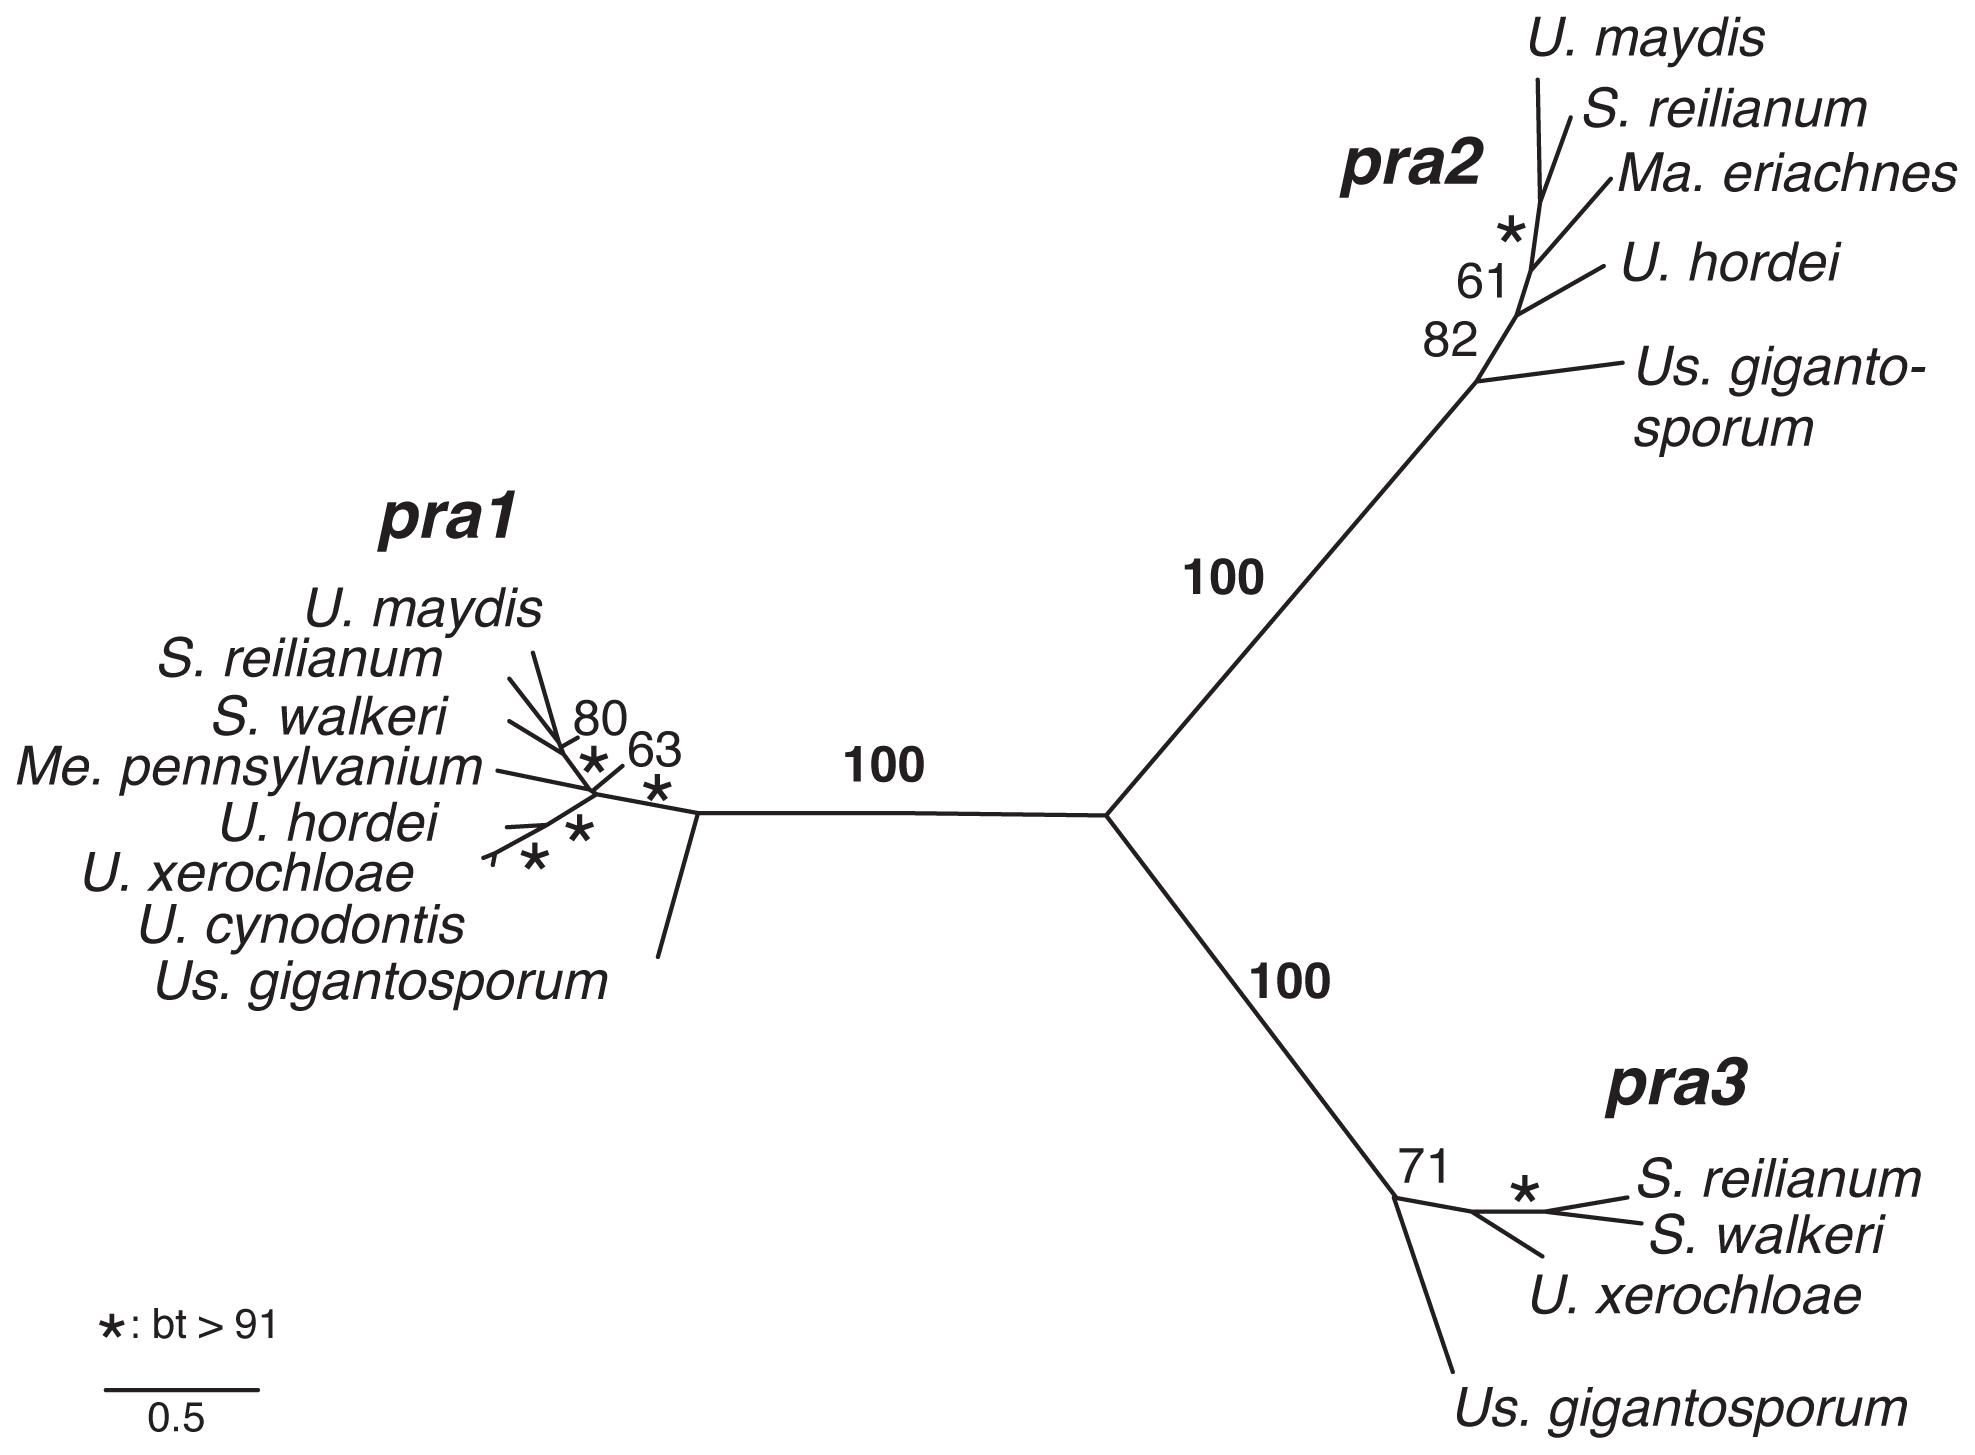 Phylogeny of mating type-specific pheromone receptors.